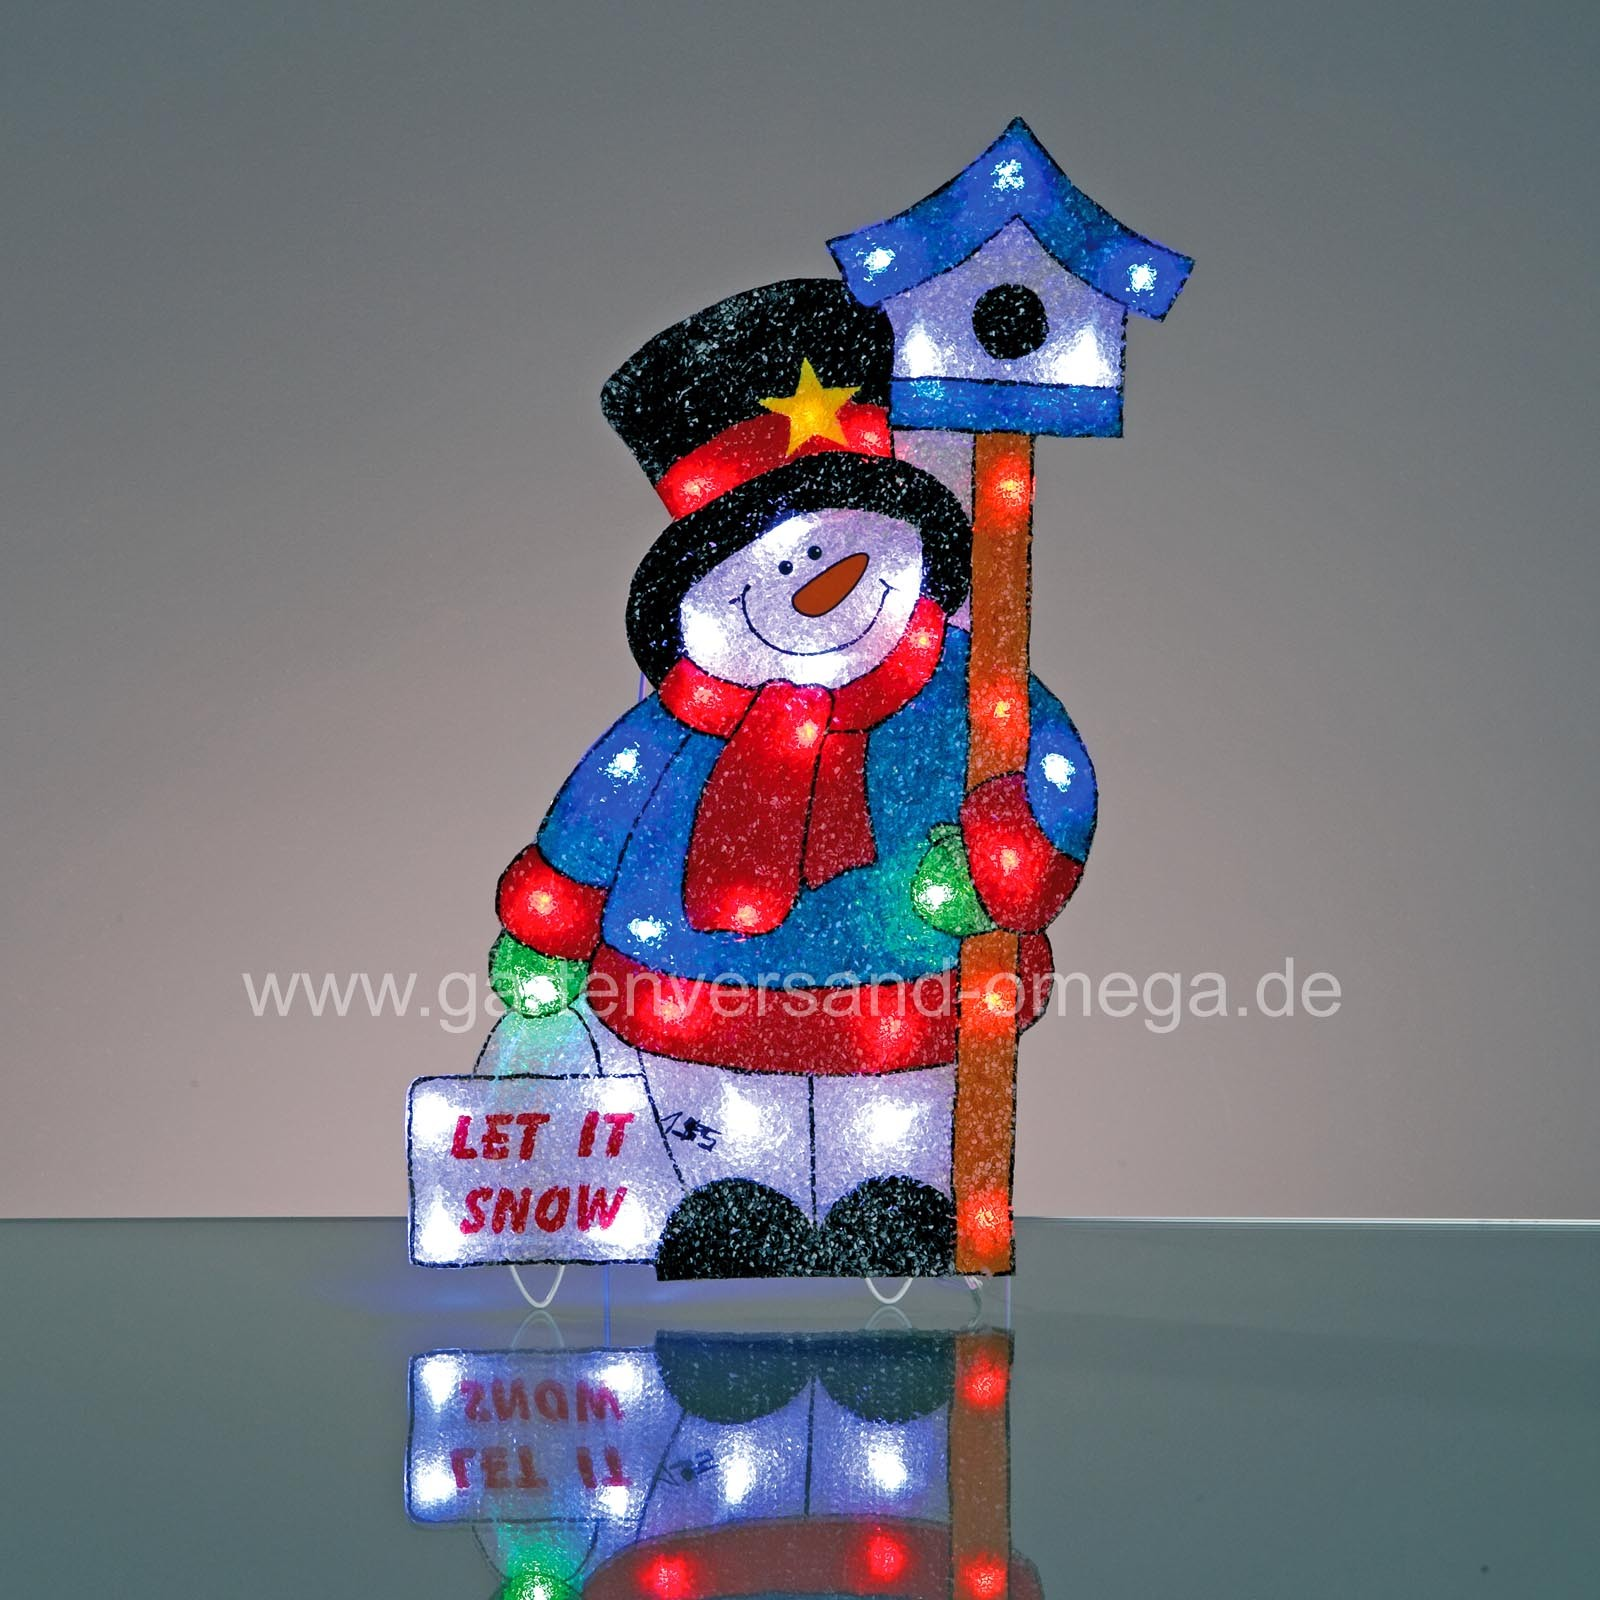 weihnachtsbeleuchtung au en figuren weihnachtsdeko beleuchtet weihnachtsbeleuchtung au en 80. Black Bedroom Furniture Sets. Home Design Ideas